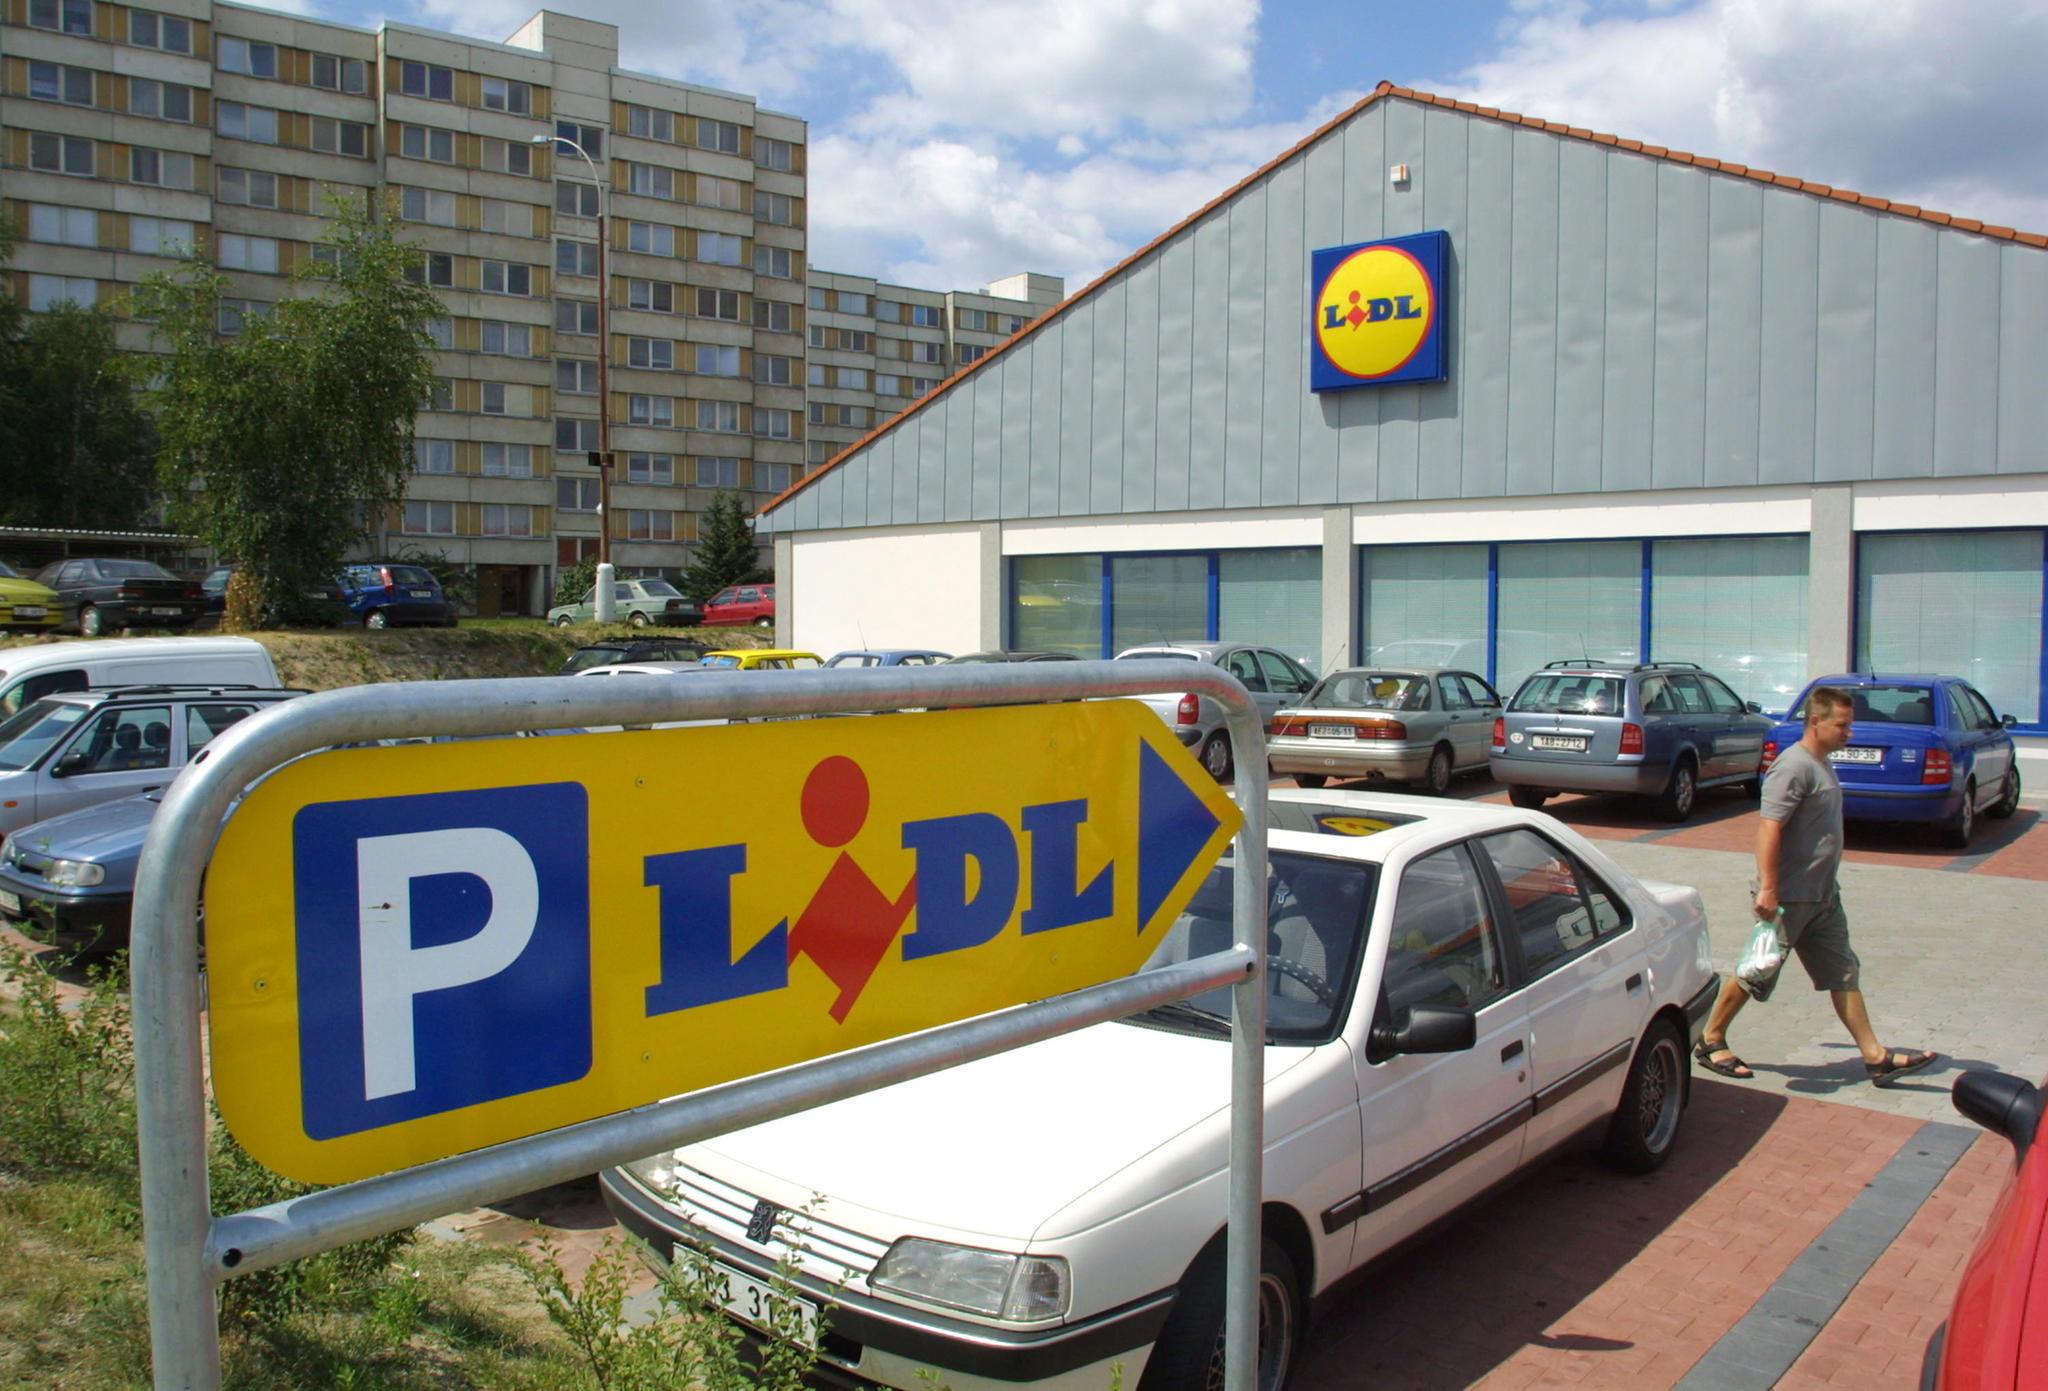 Parkplatz bei Lidl